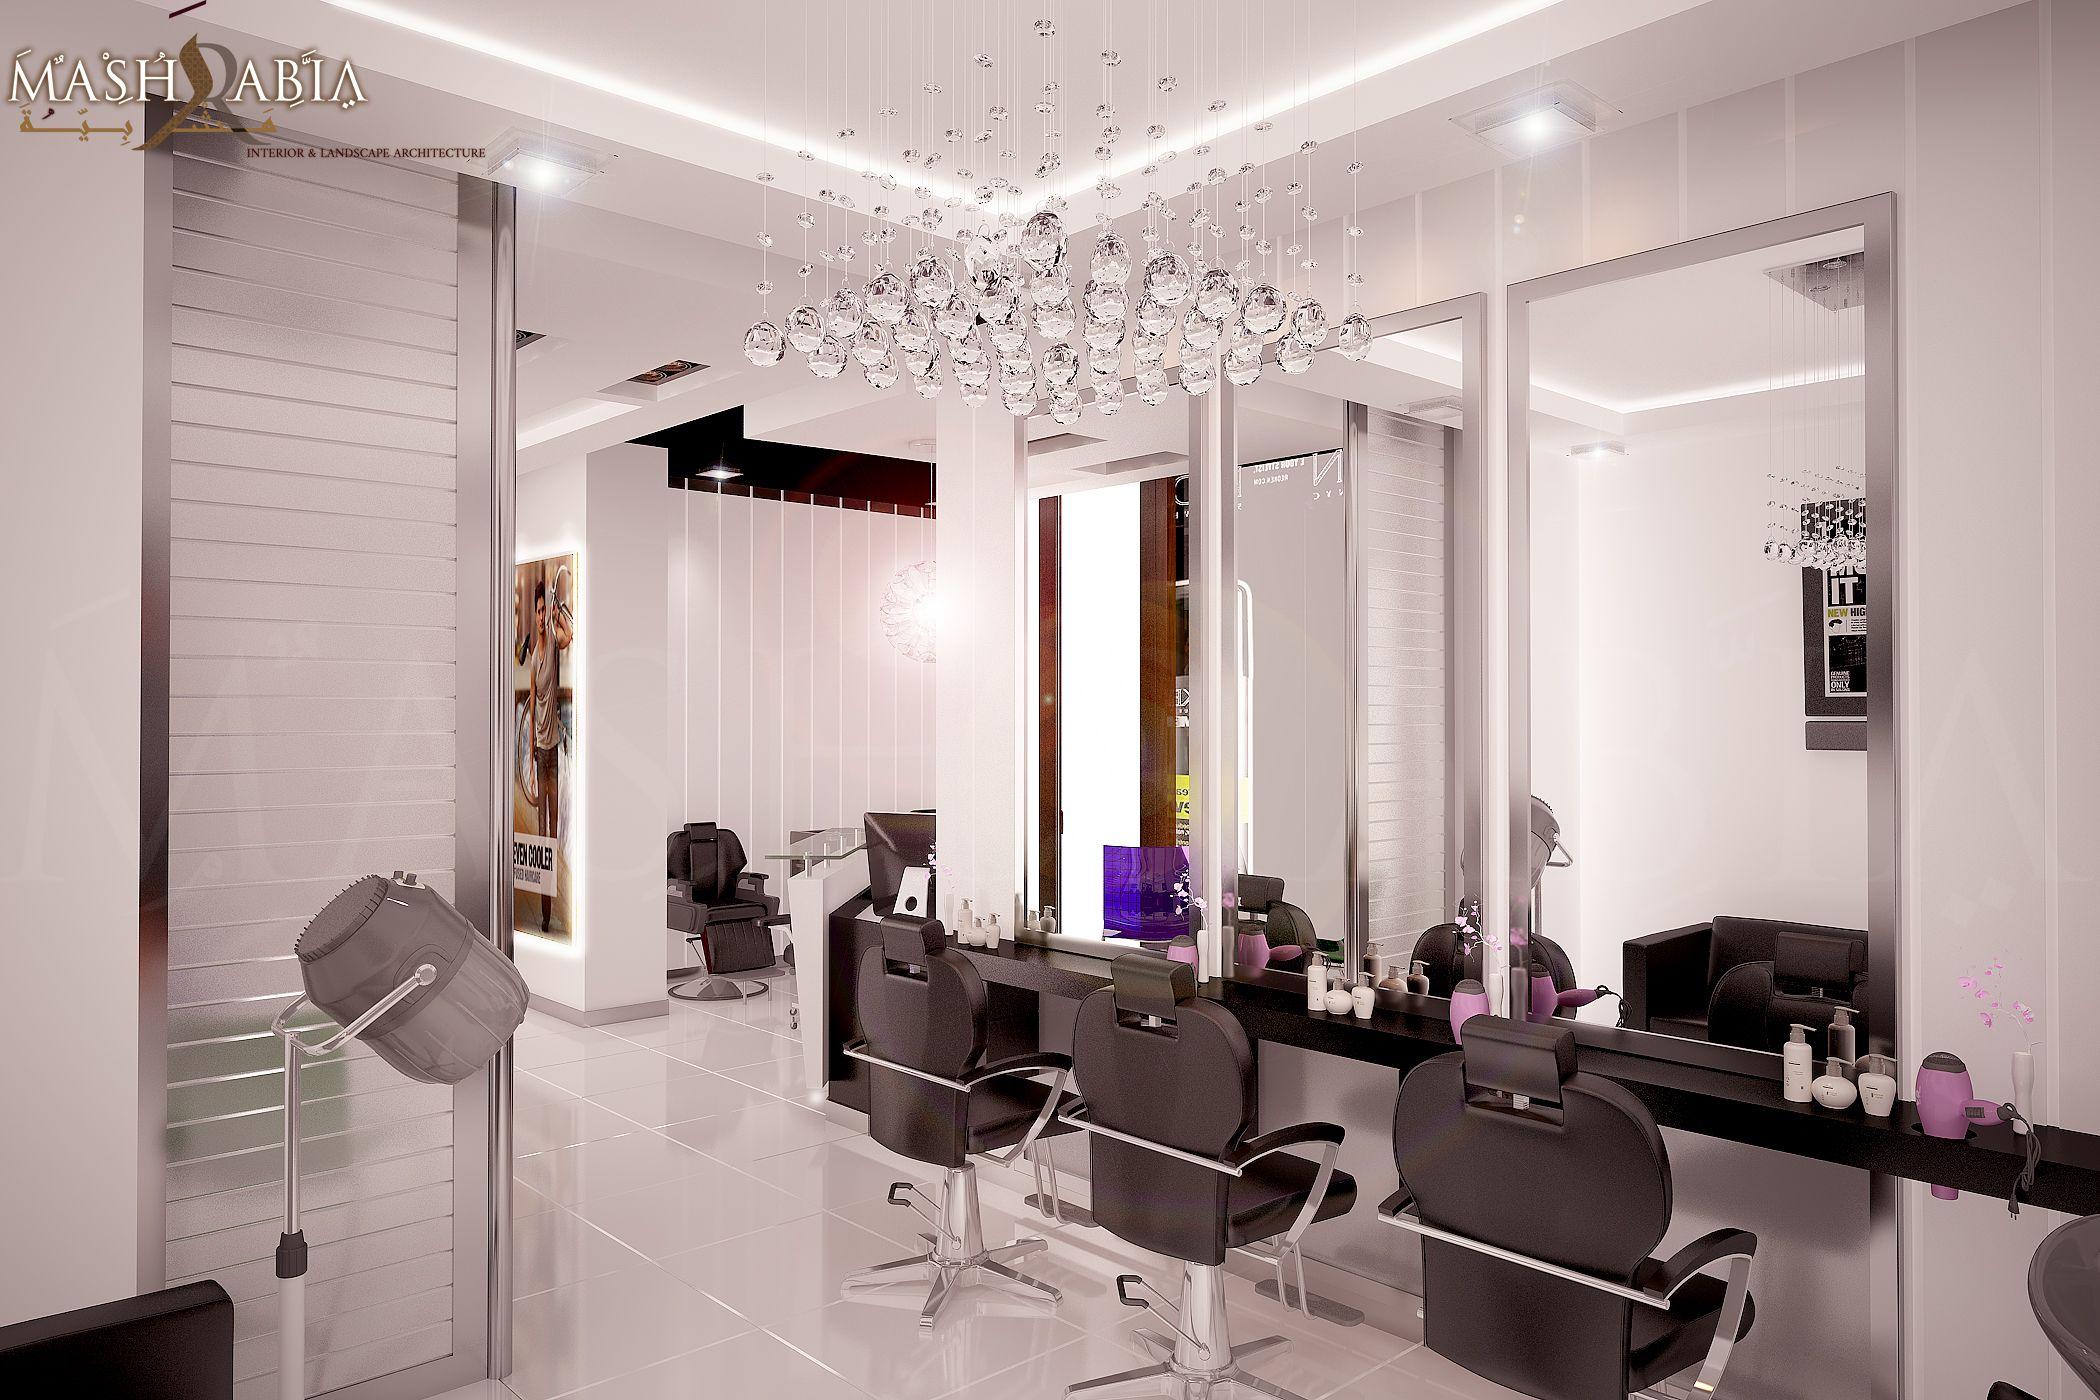 shot 2 PaceEluce Pace e Luce Hair and Beauty Salon Salon